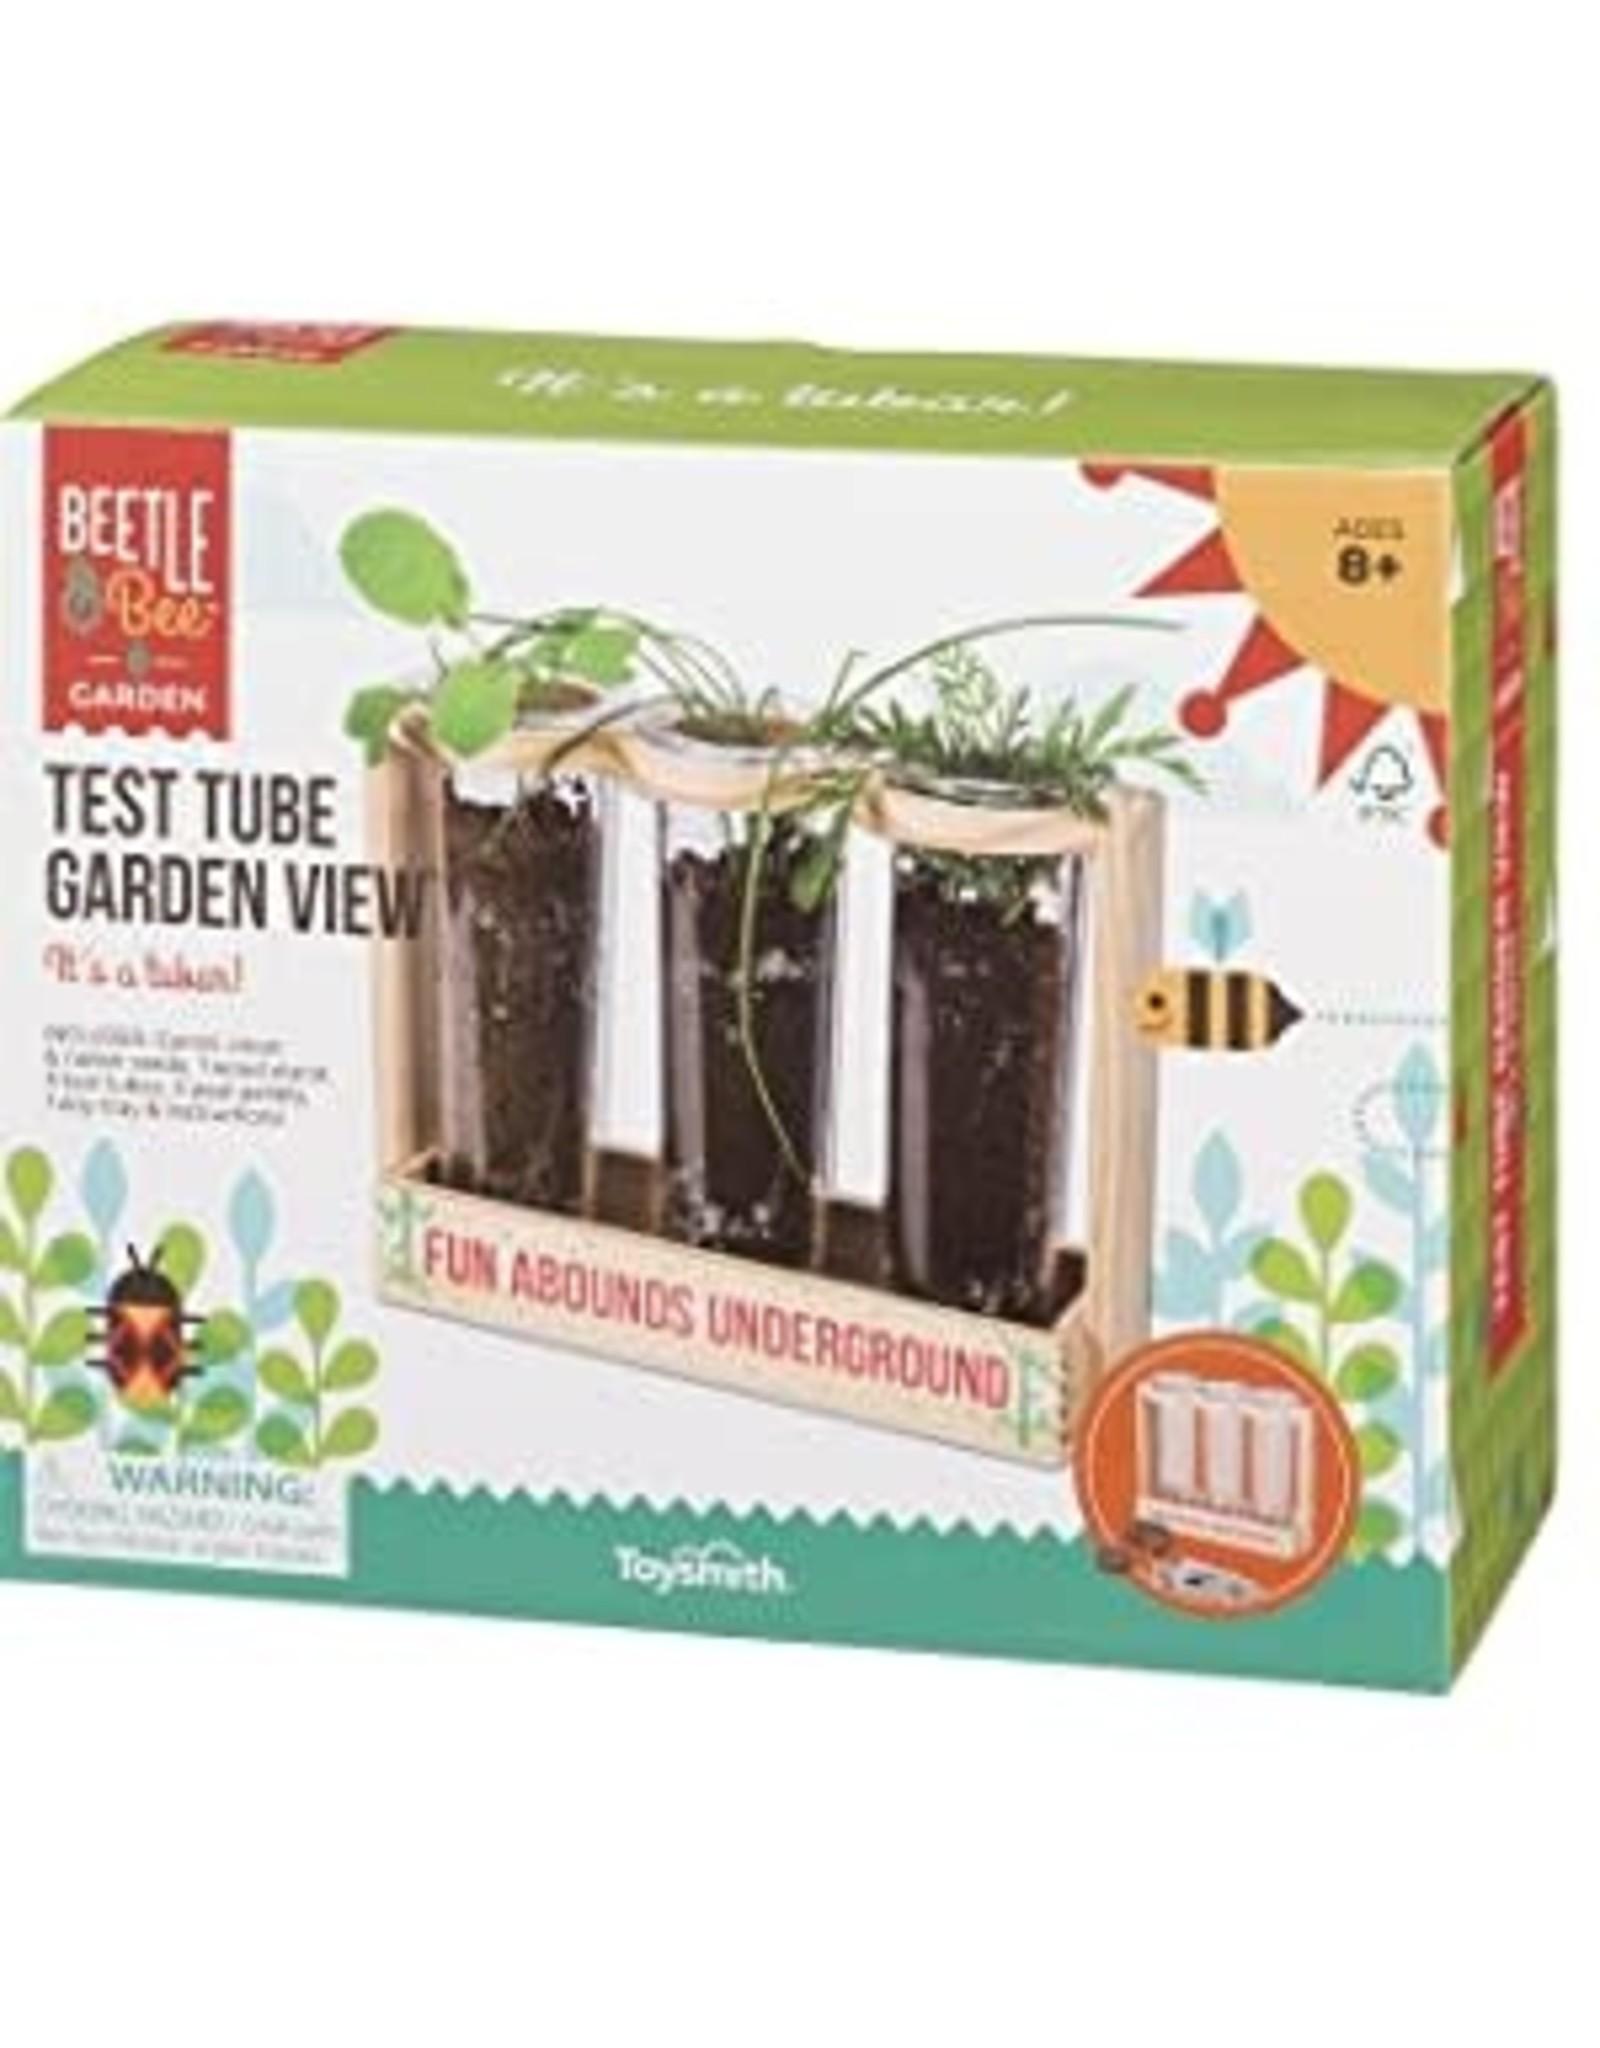 Test Tube Garden View